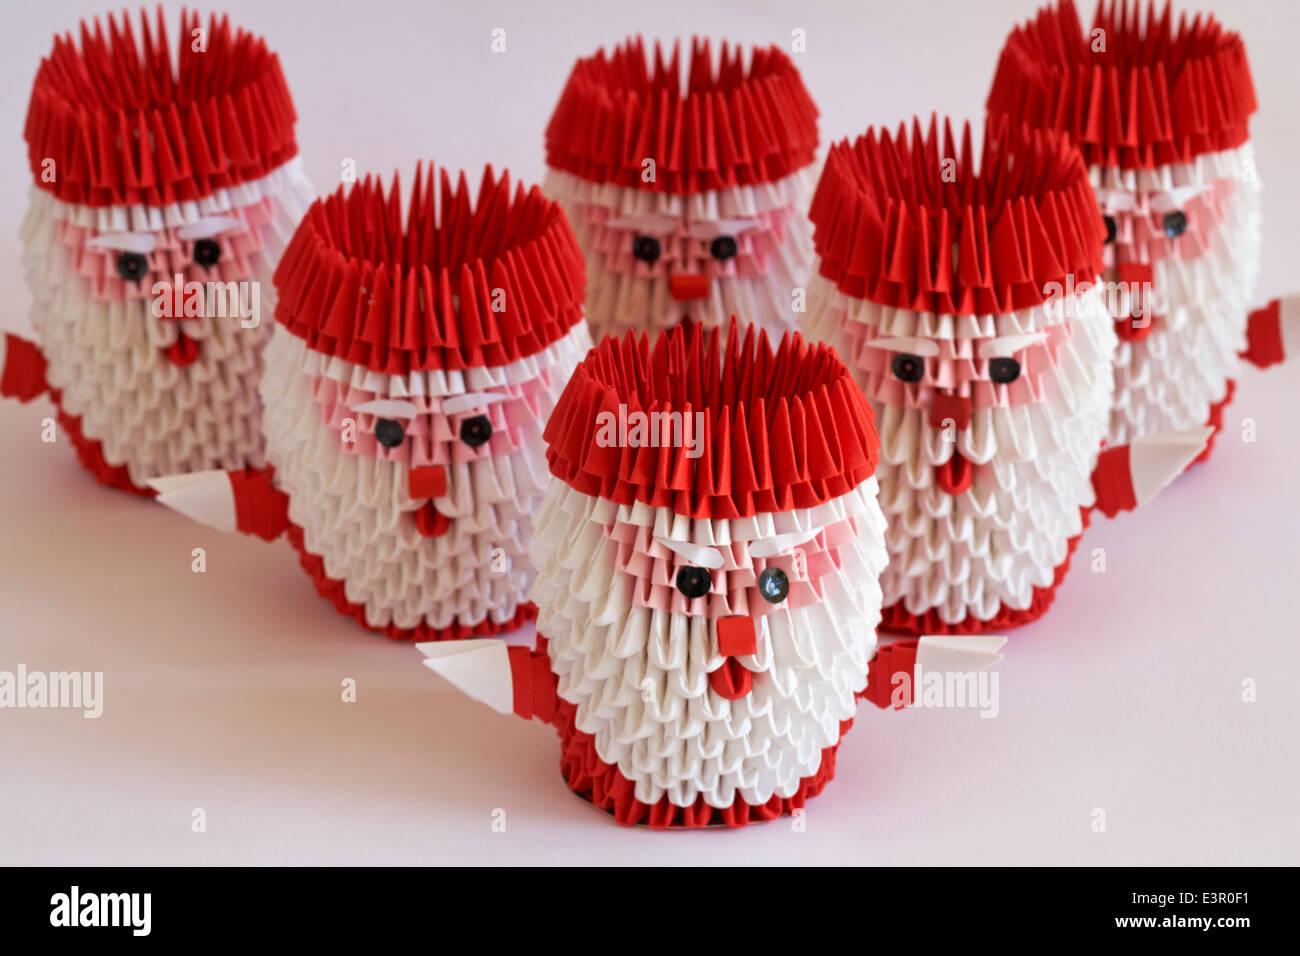 How to Make DIY Origami Santa Claus? | The Idea King Tutorial #40 ... | 956x1300